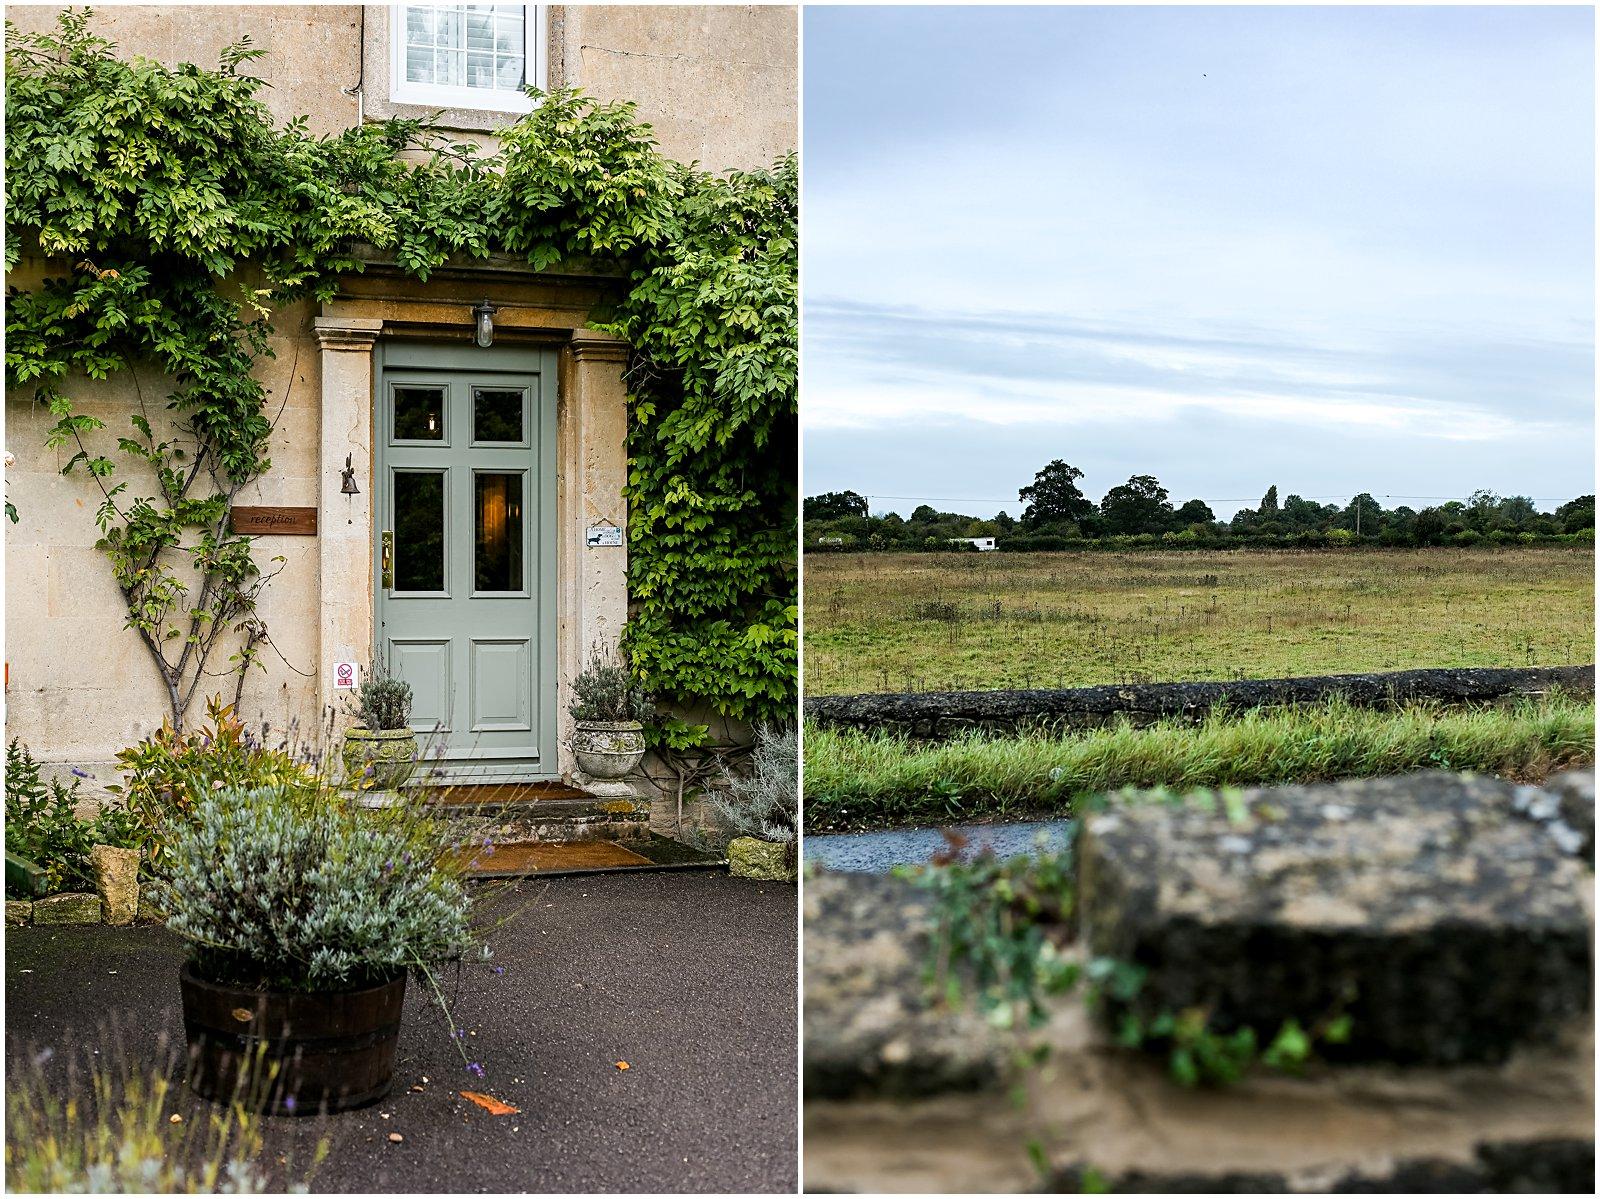 Widbrook Grange Hotel in Wiltshire England